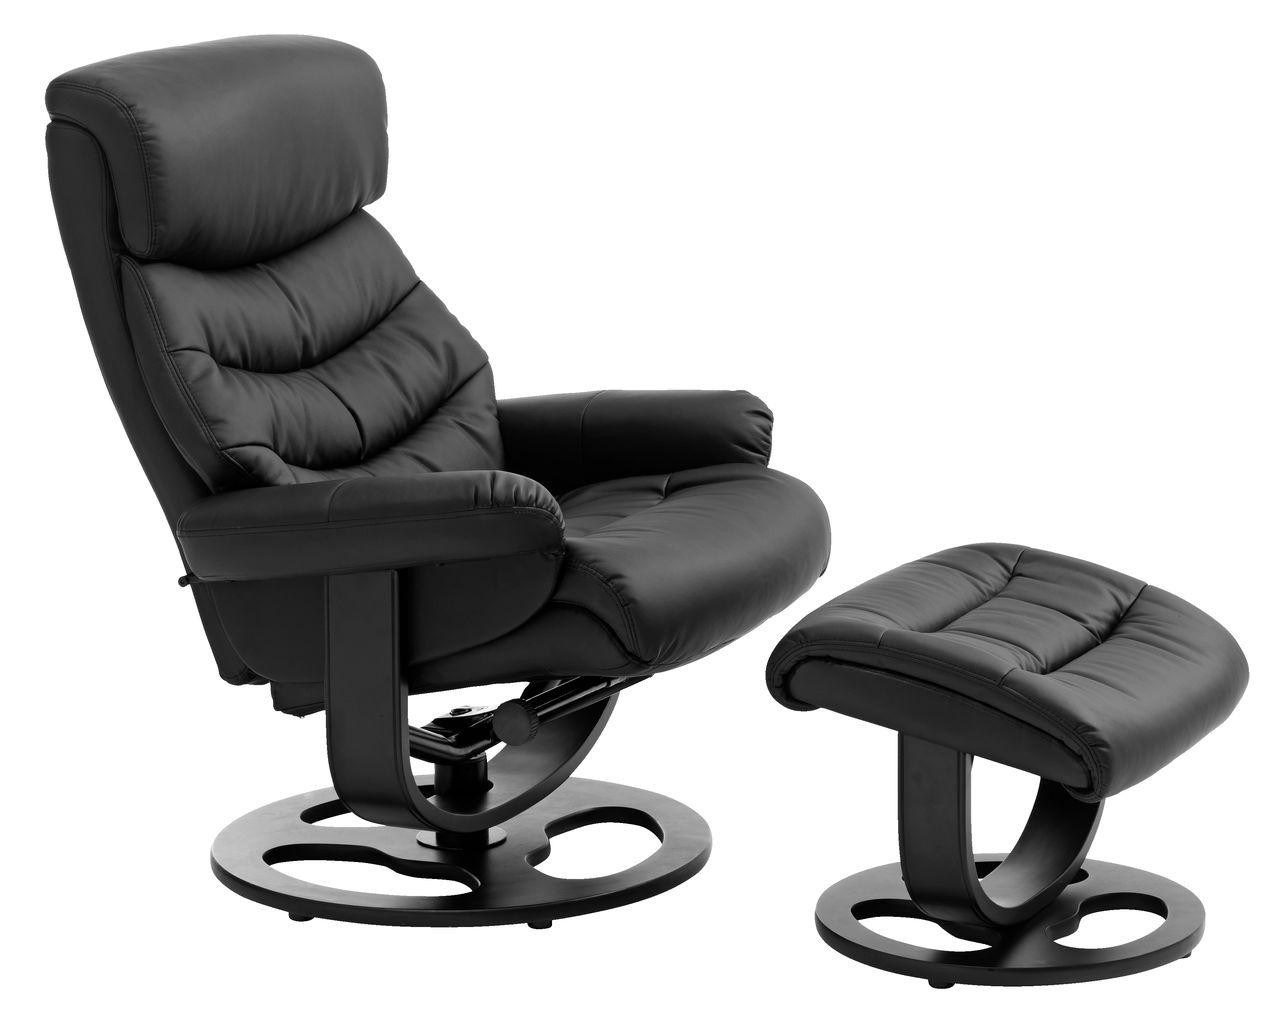 Fauteuil de bureau jysk chaise de bureau ikea le blog des geeks et